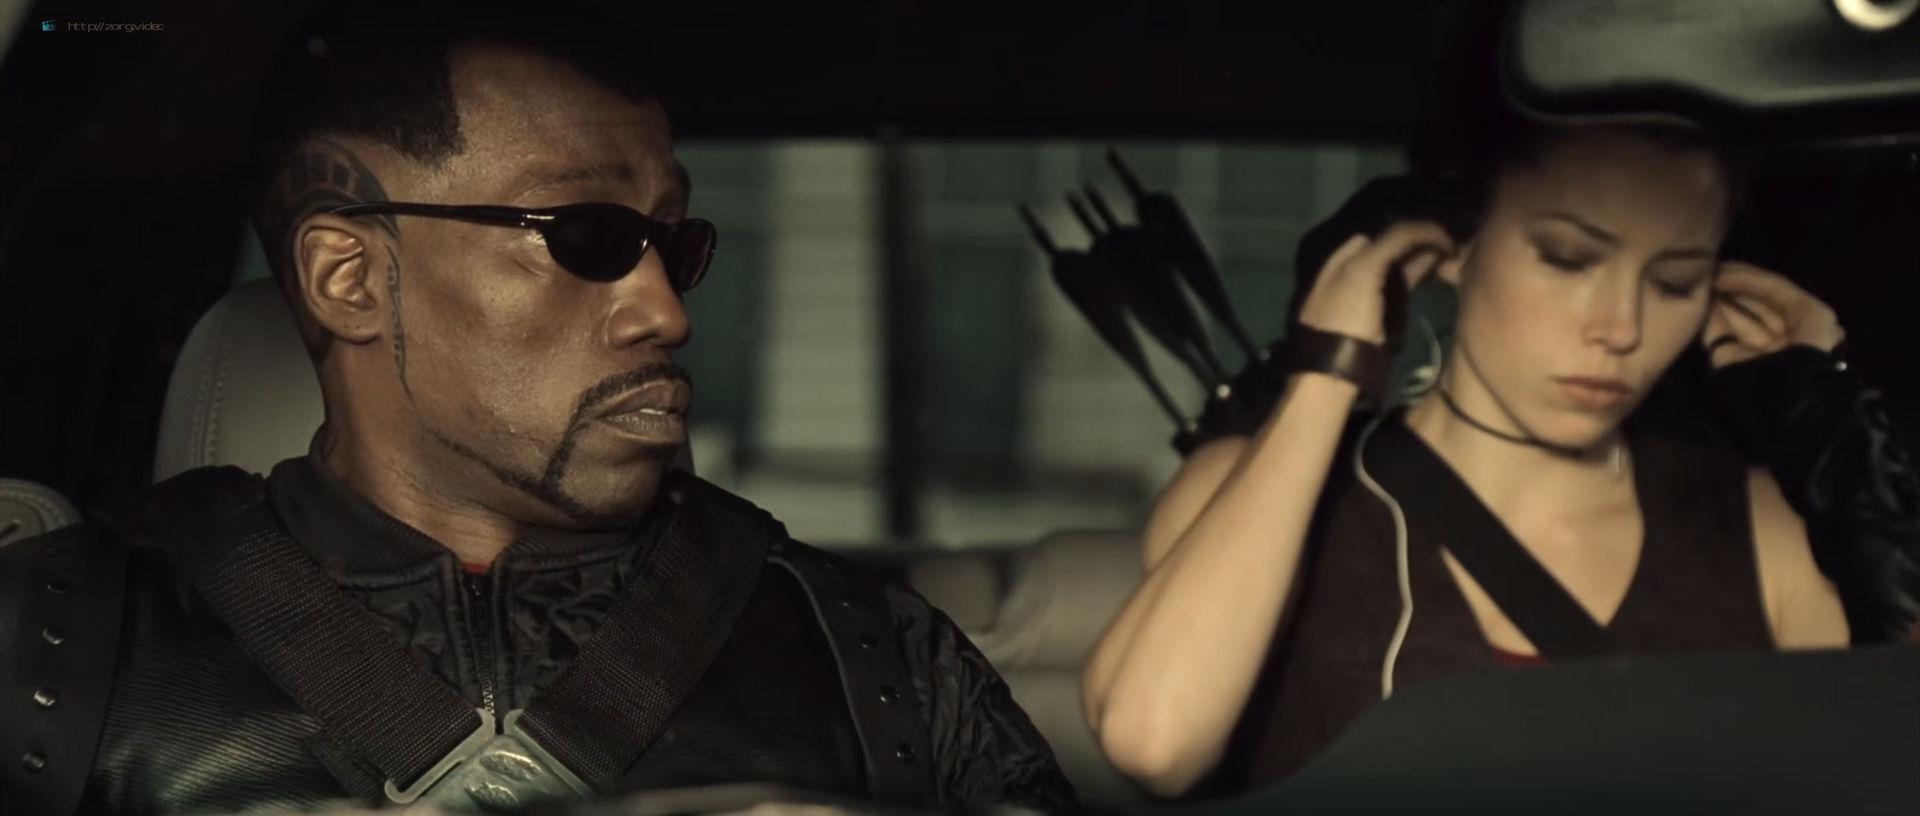 Jessica Biel hot and sexy - Blade Trinity (2004) HD 1080p BluRay (18)